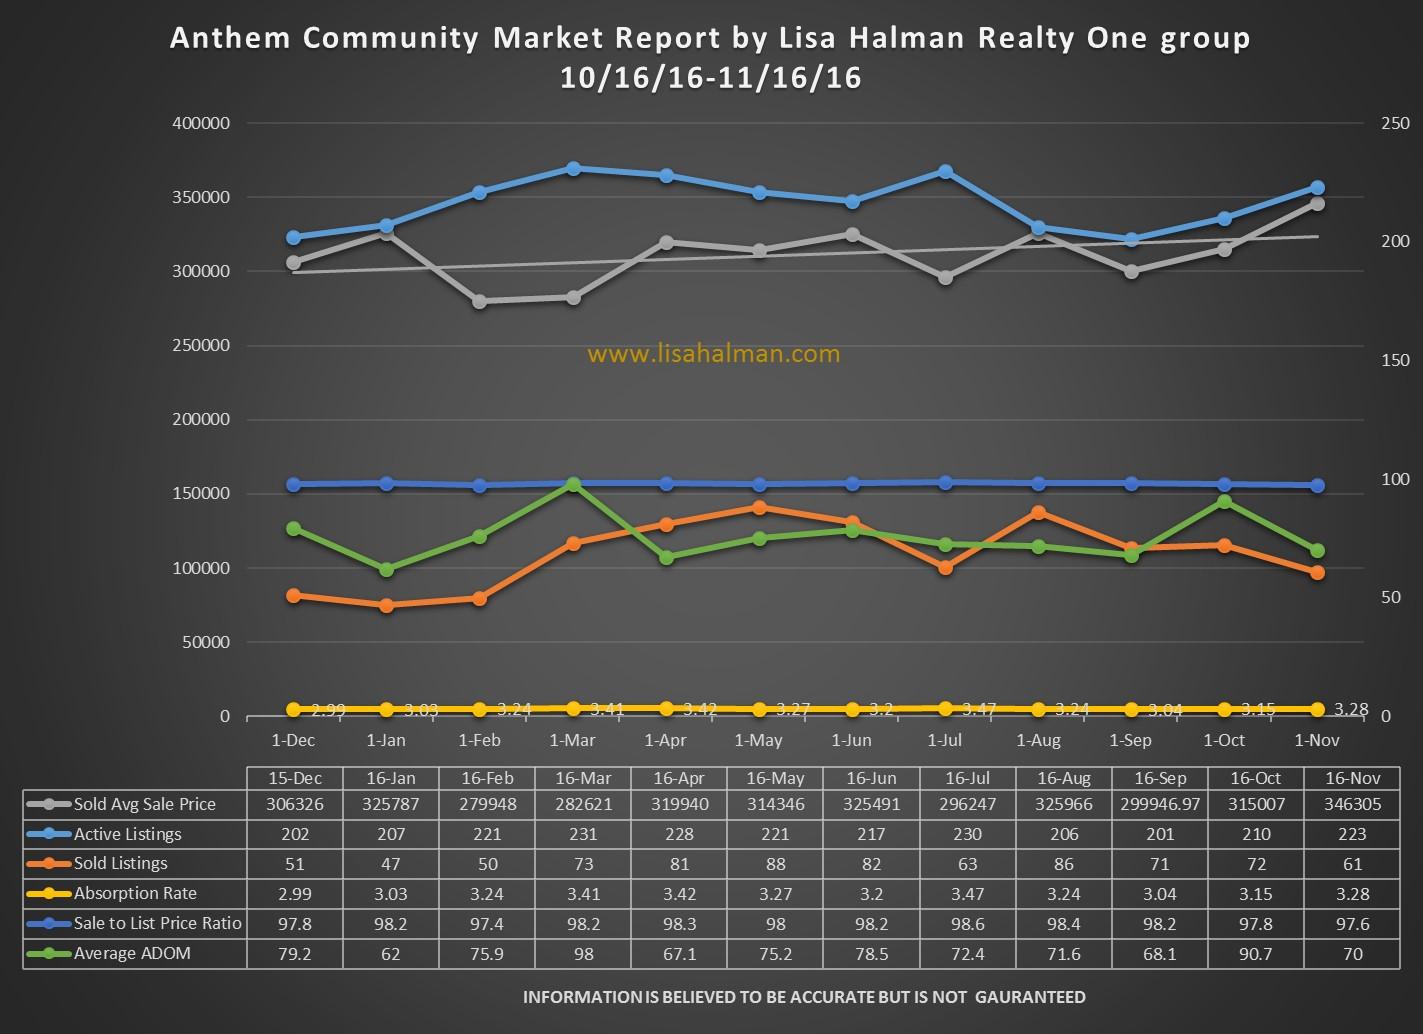 Anthem Community Market Report November 2016